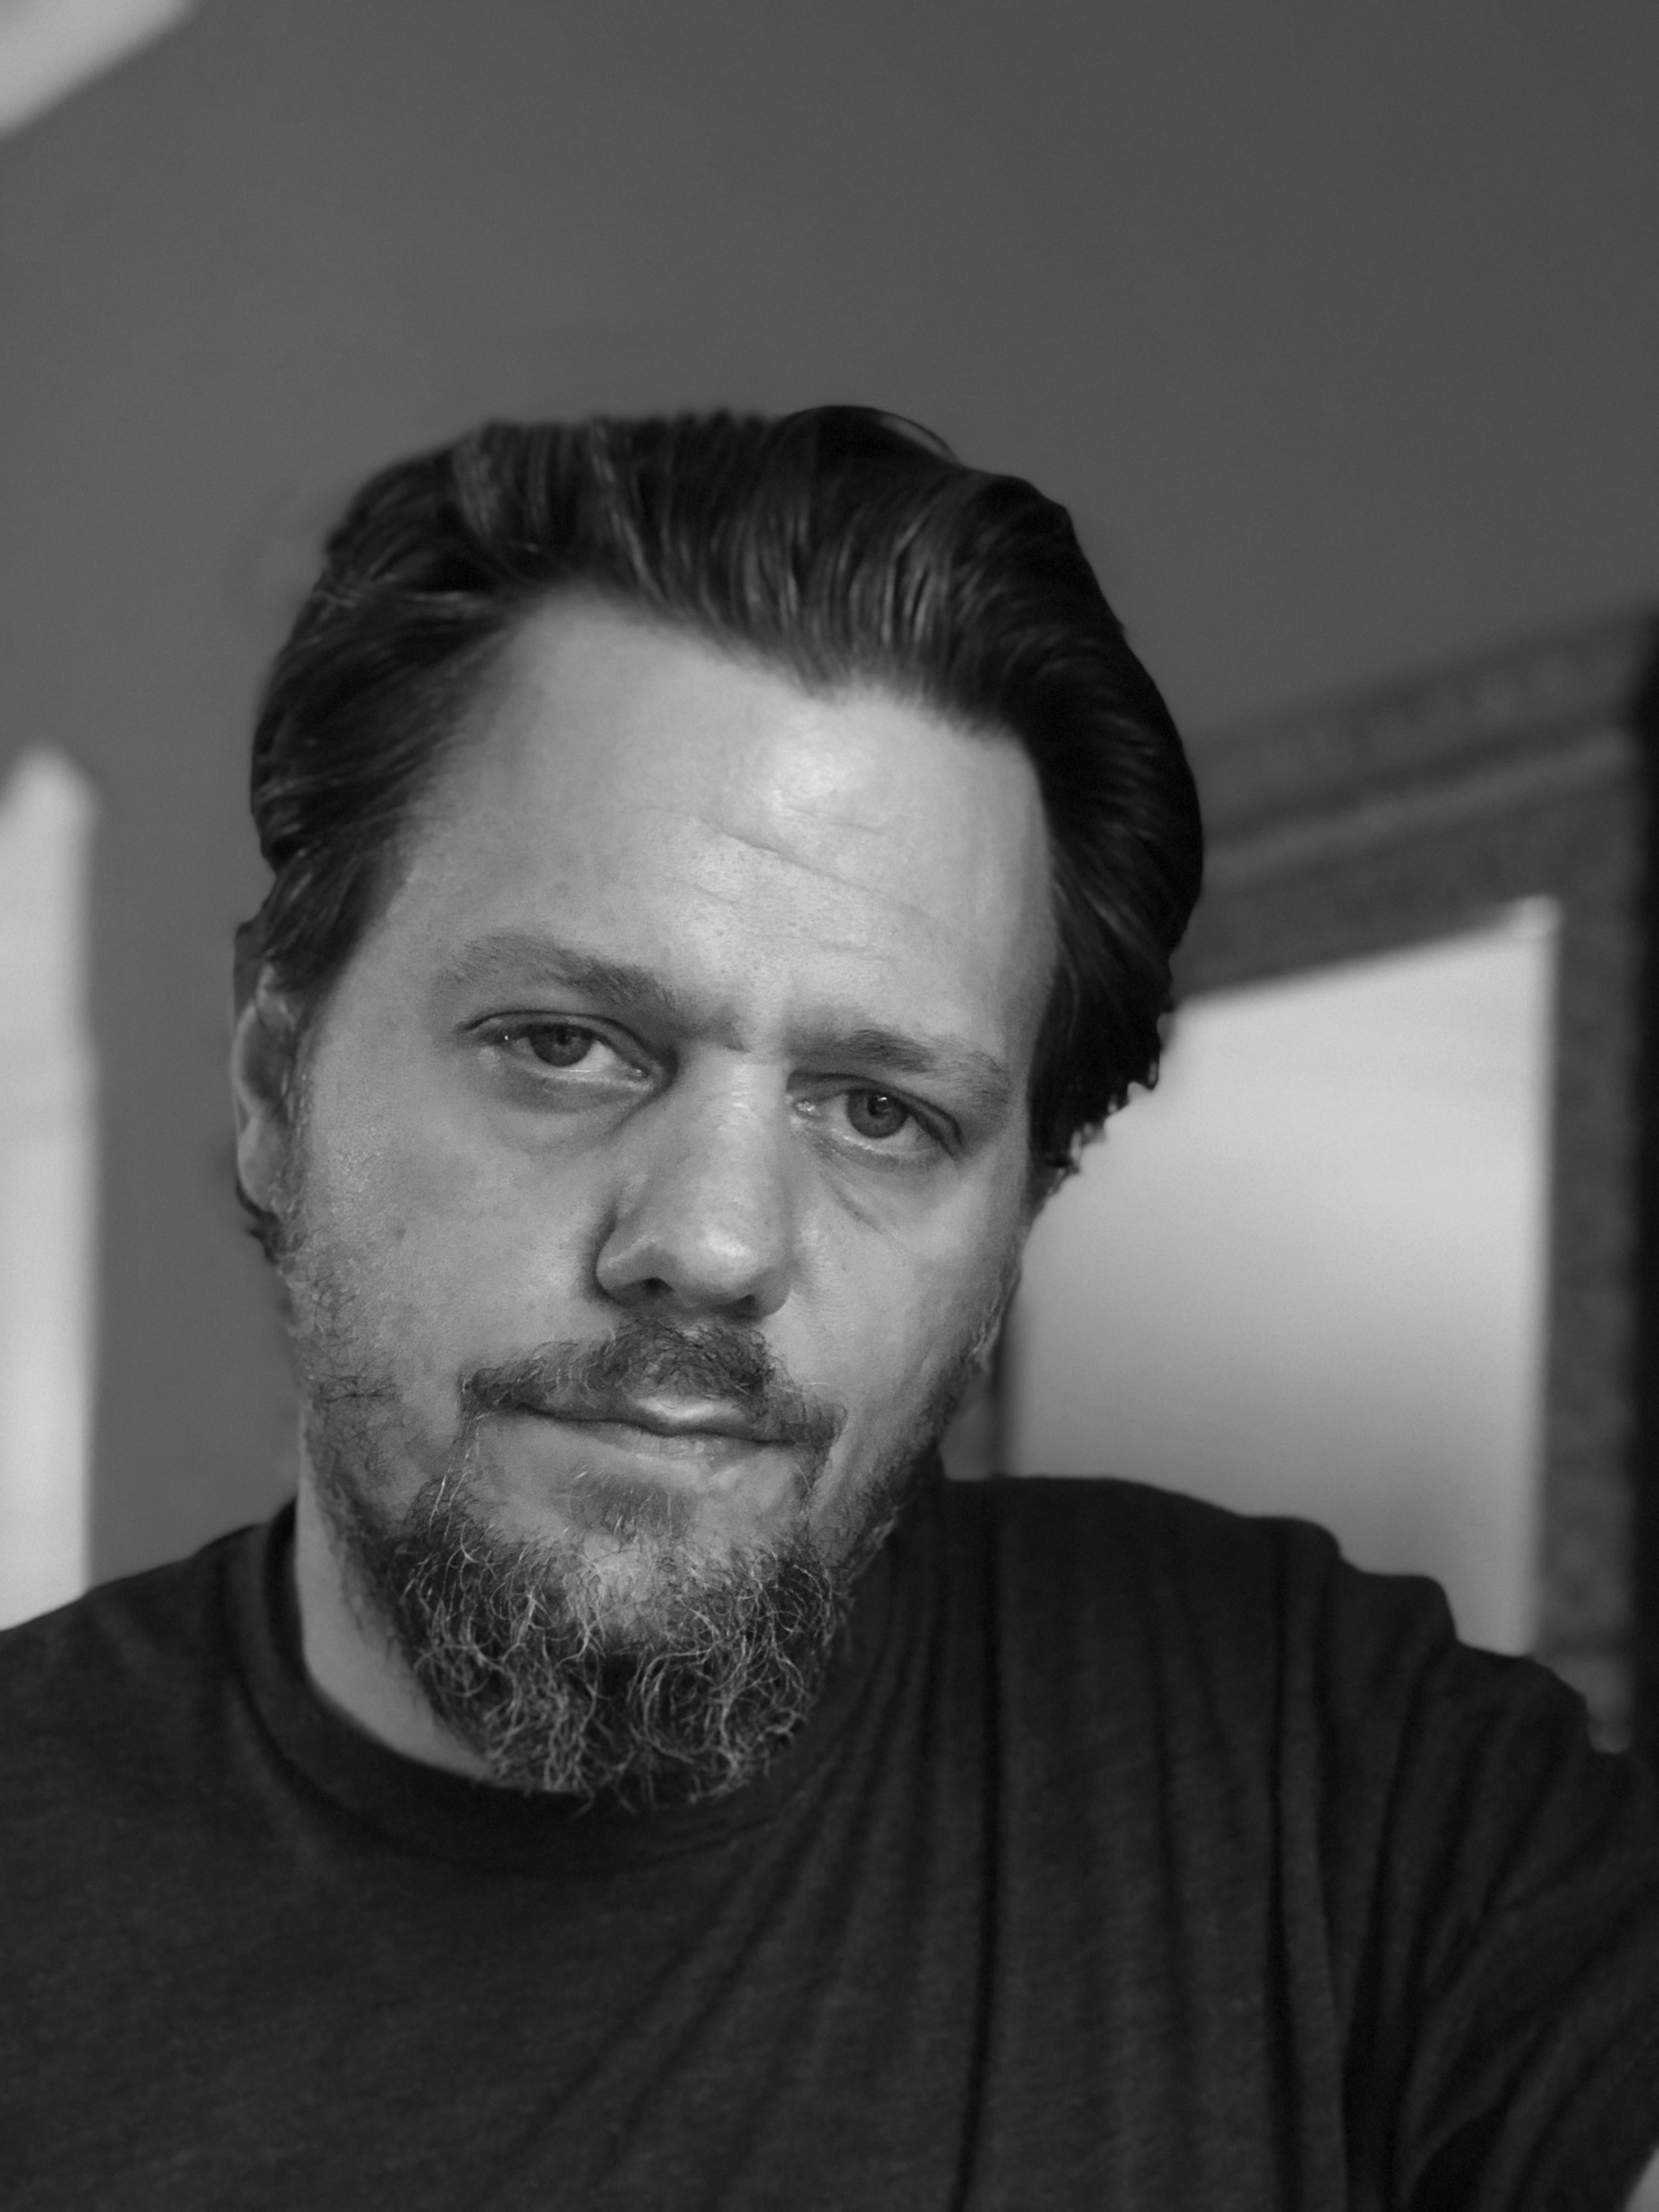 R.W. headshot 2018 black and white.jpg